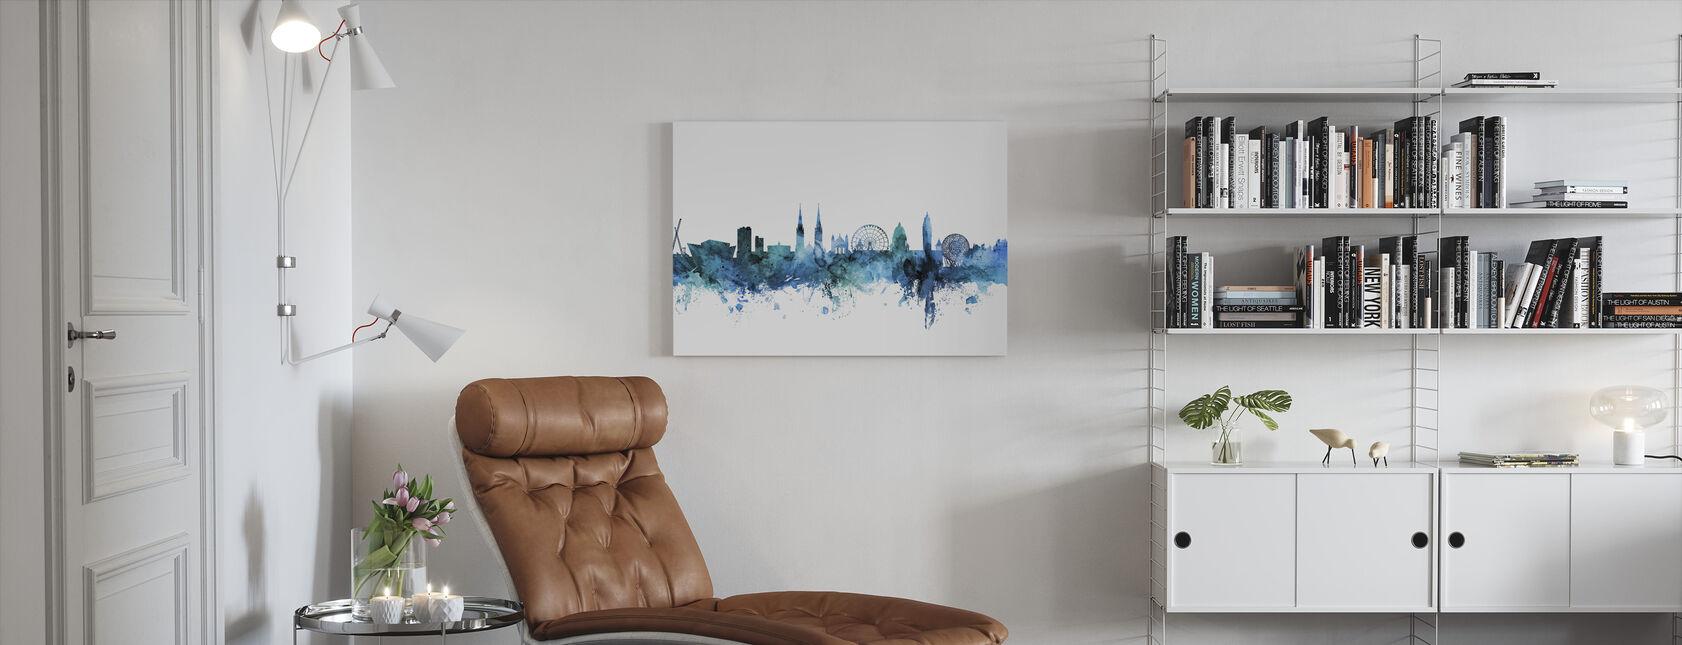 Belfast Northern Ireland Skyline - Canvas print - Living Room